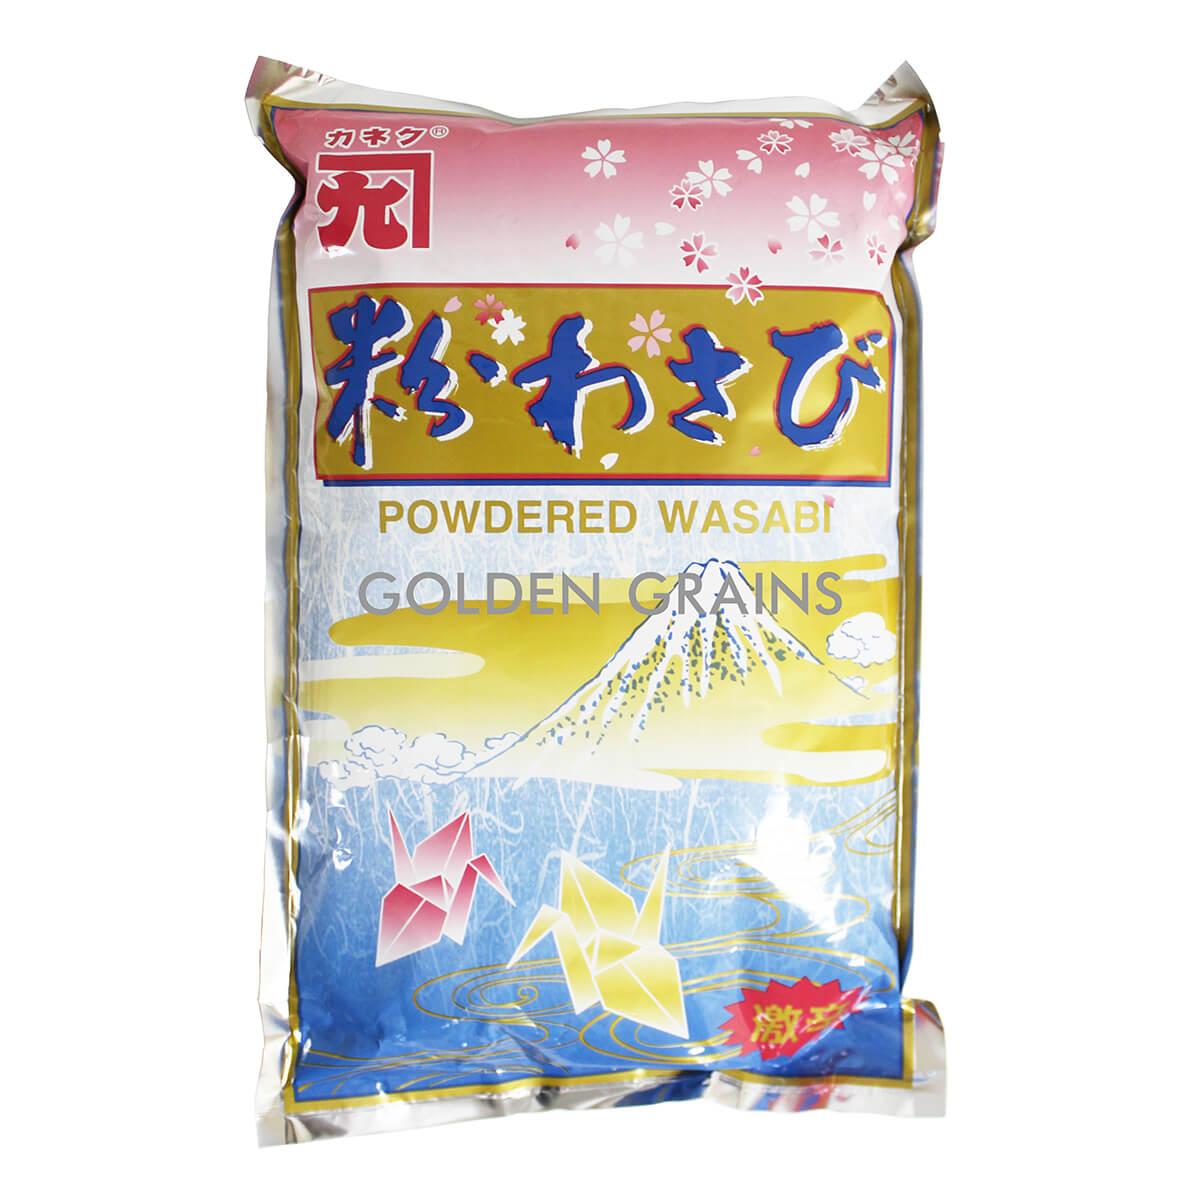 Golden Grains Dubai Export - Powdered Wasabi  - Front.jpg